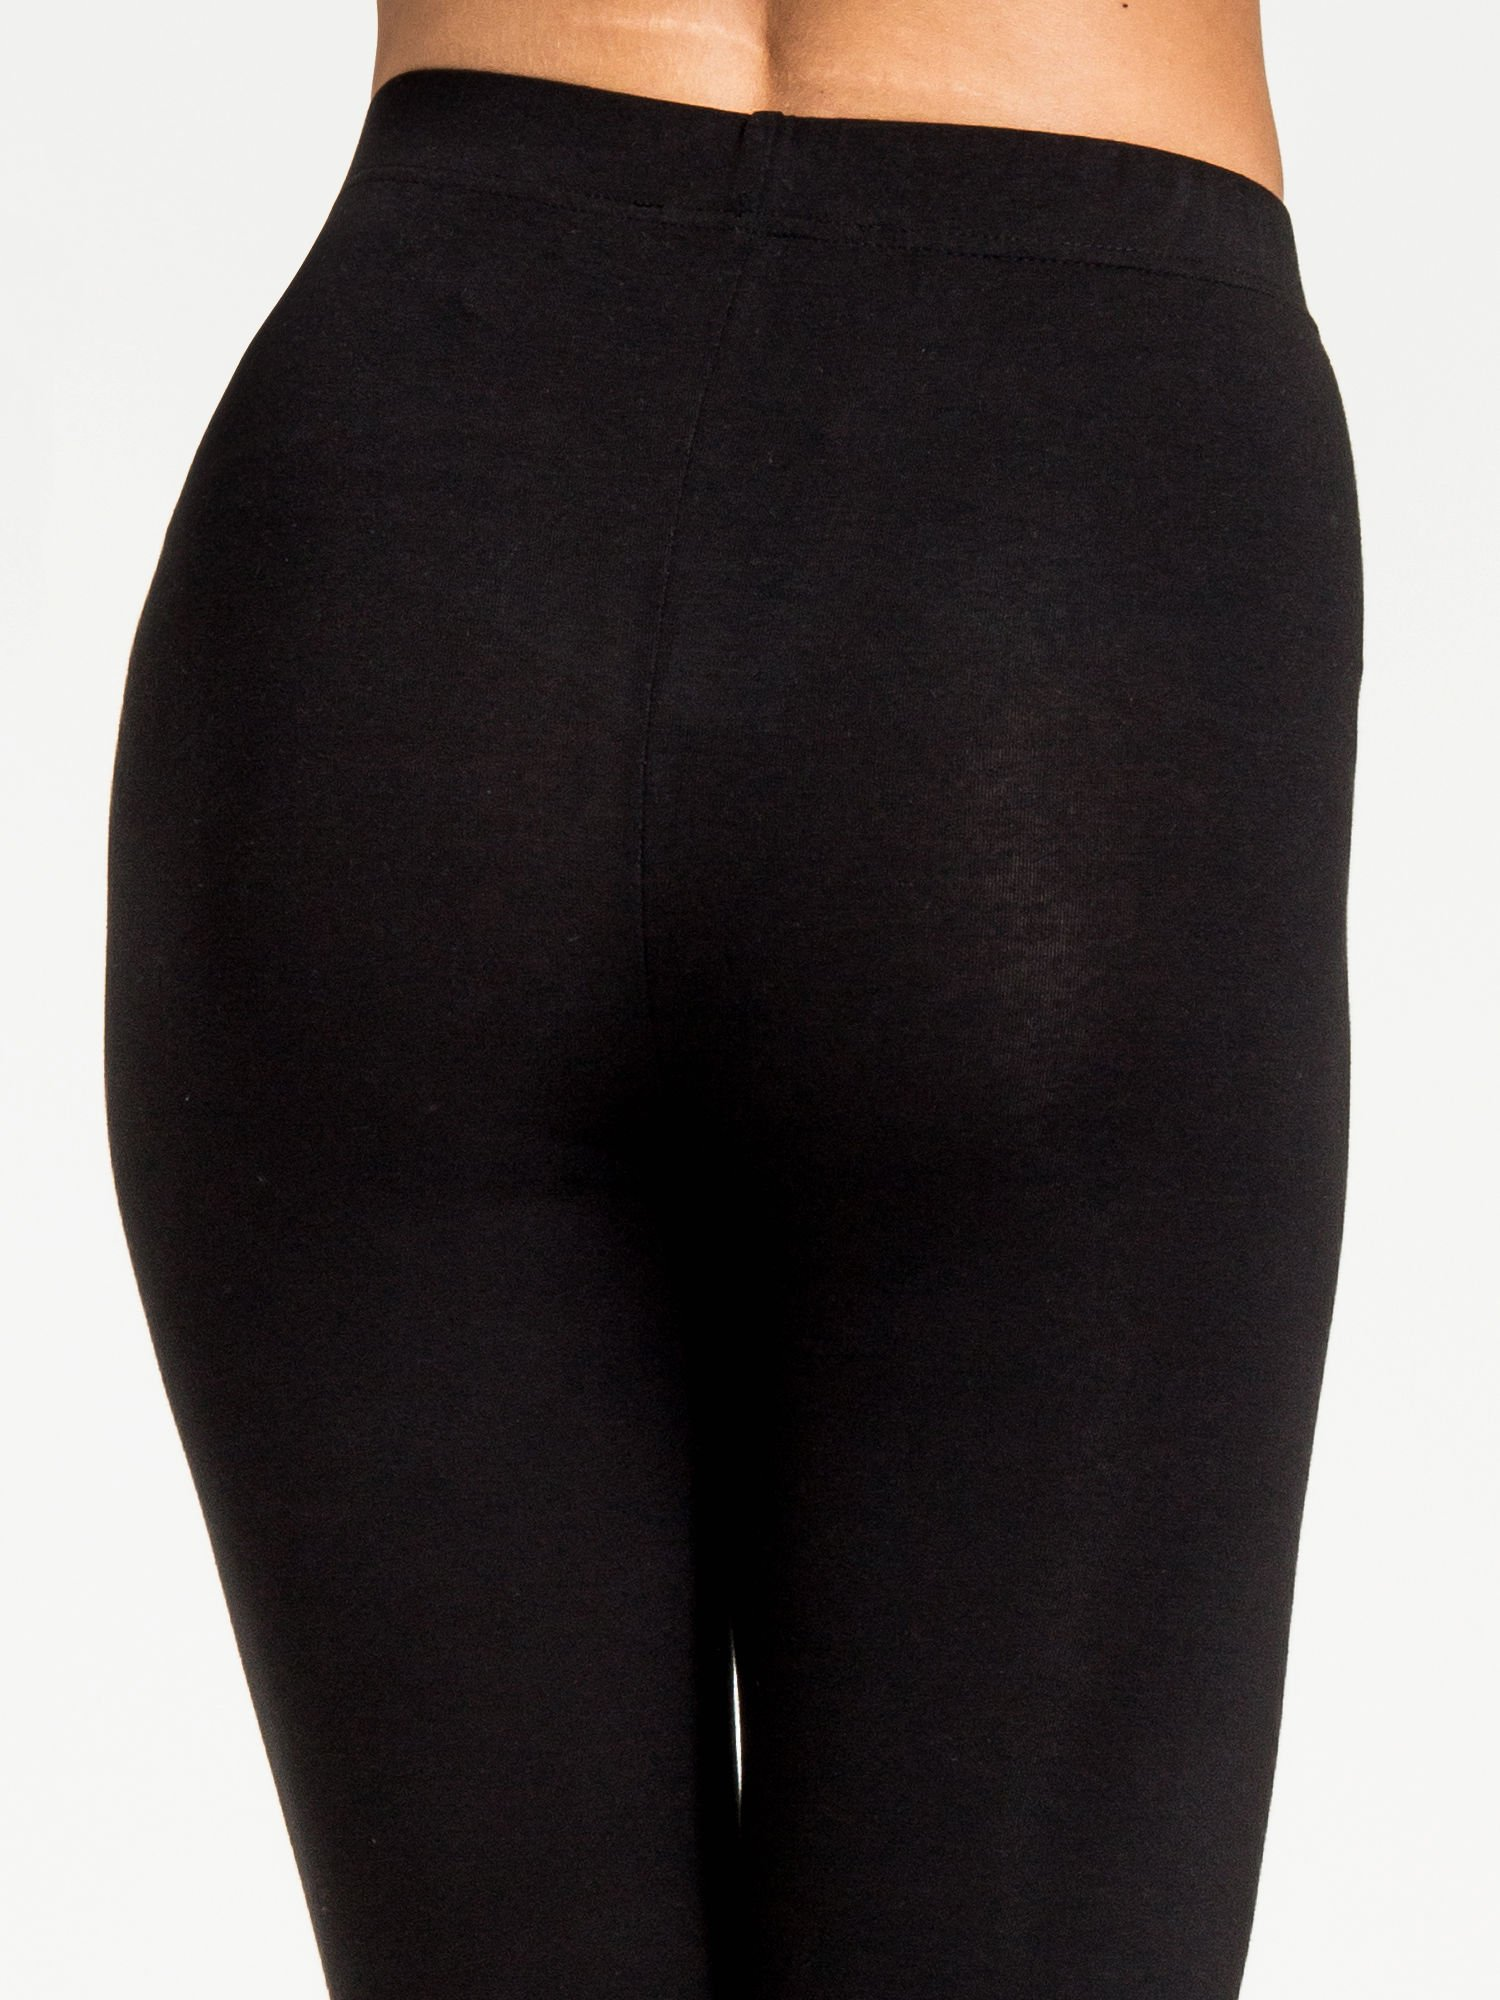 Czarne legginsy z dżetami na dole                                  zdj.                                  7